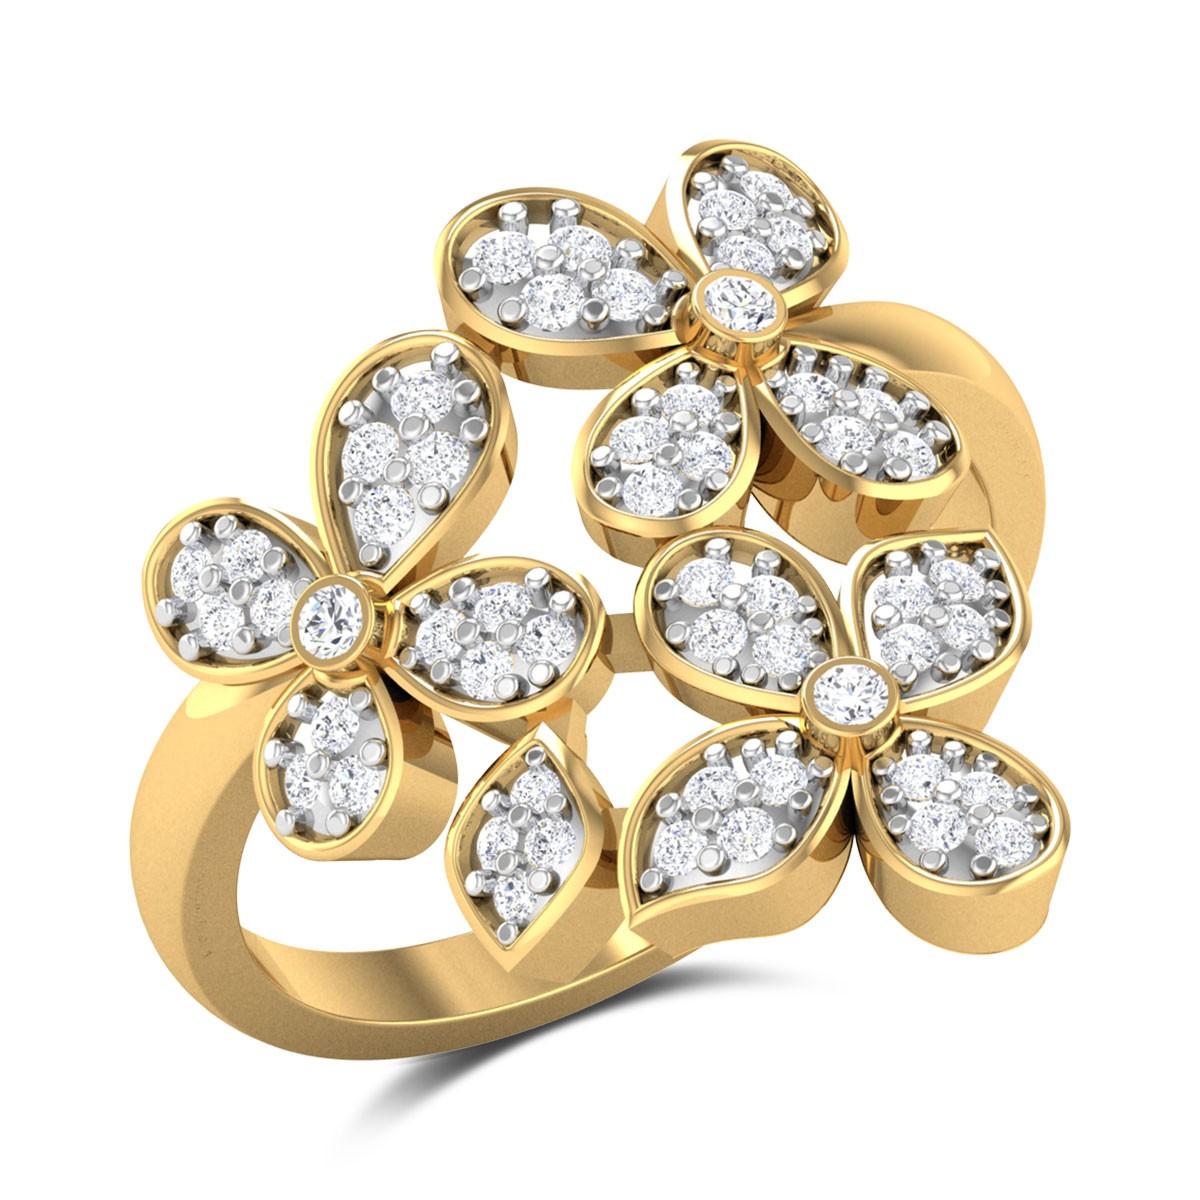 Ishat Floral Diamond Ring